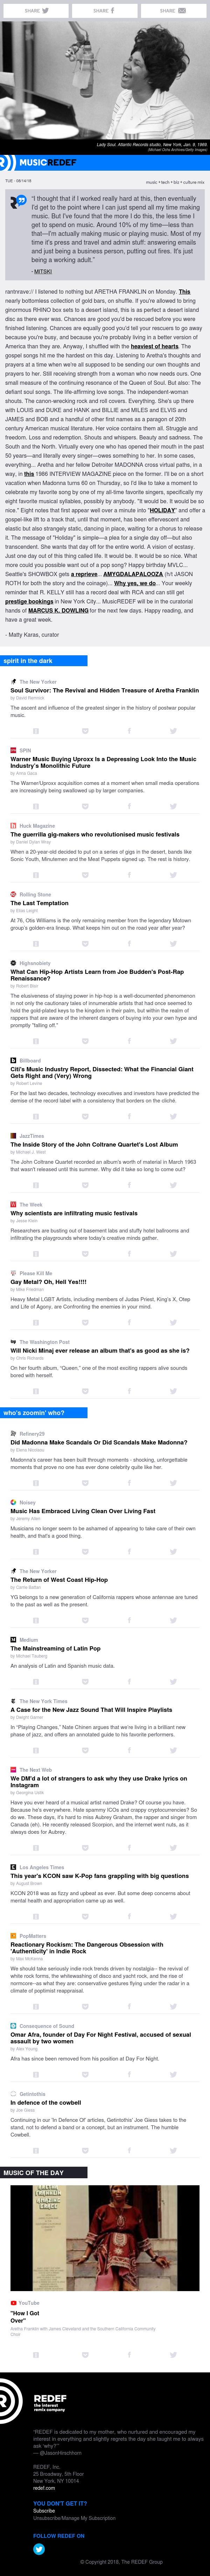 jason hirschhorn's @MusicREDEF: 08/14/2018 - Thinking of the Queen, Warner x Uproxx, The Last Temptation, Joe Budden, Nicki Minaj, 'Holiday'...